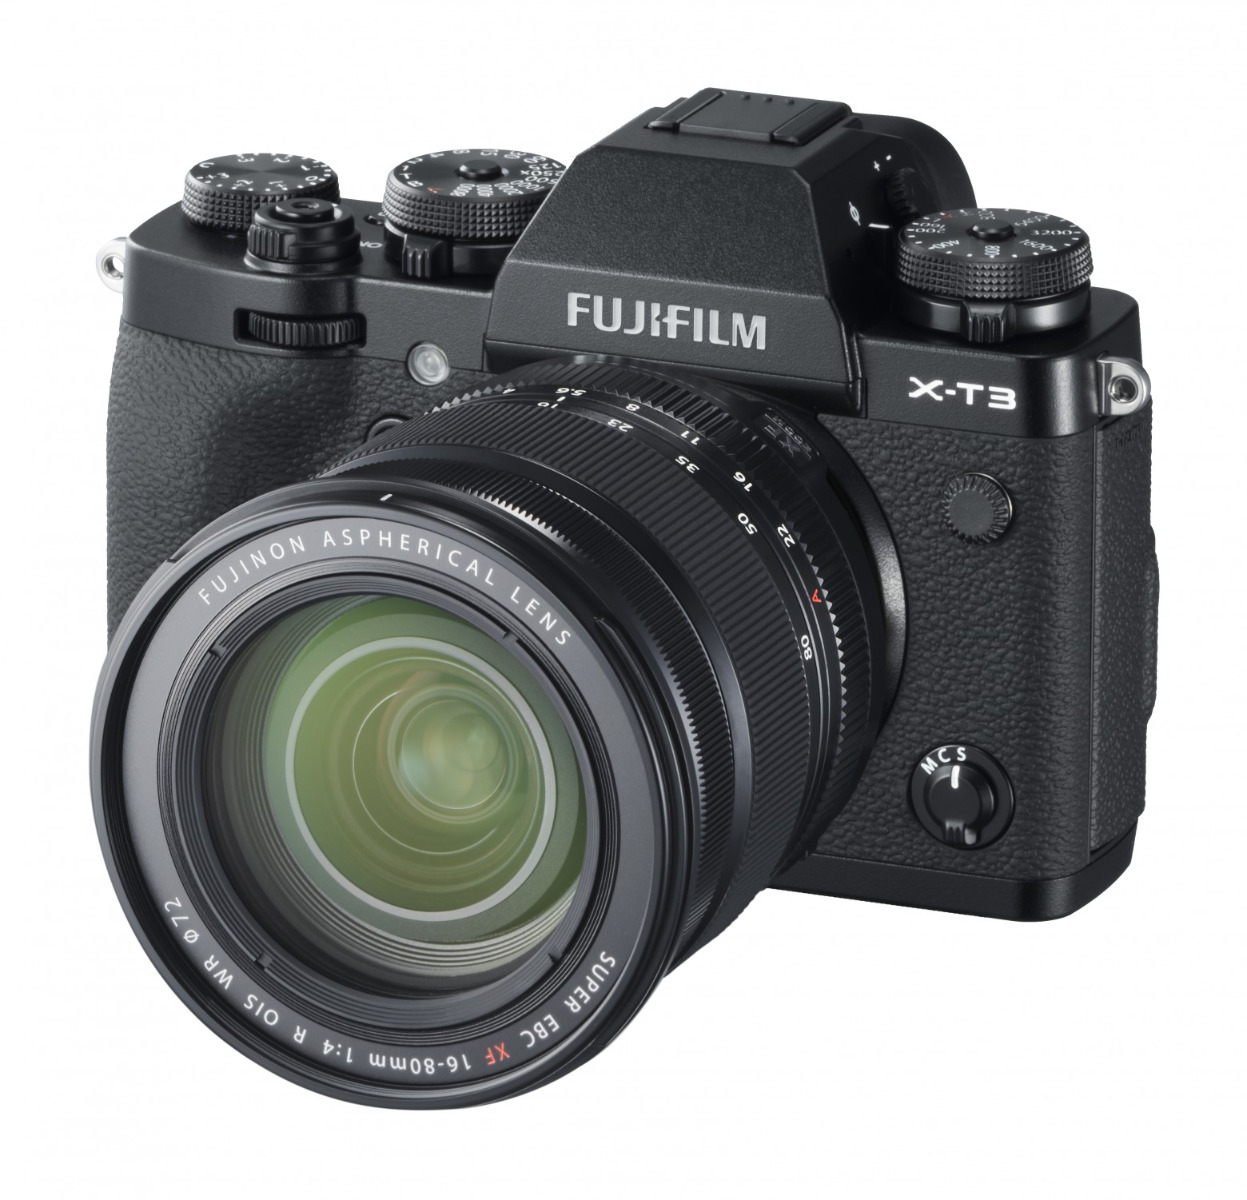 FUJIFILM X-T3  Black / XF16-80mm F4.0 R OIS WR